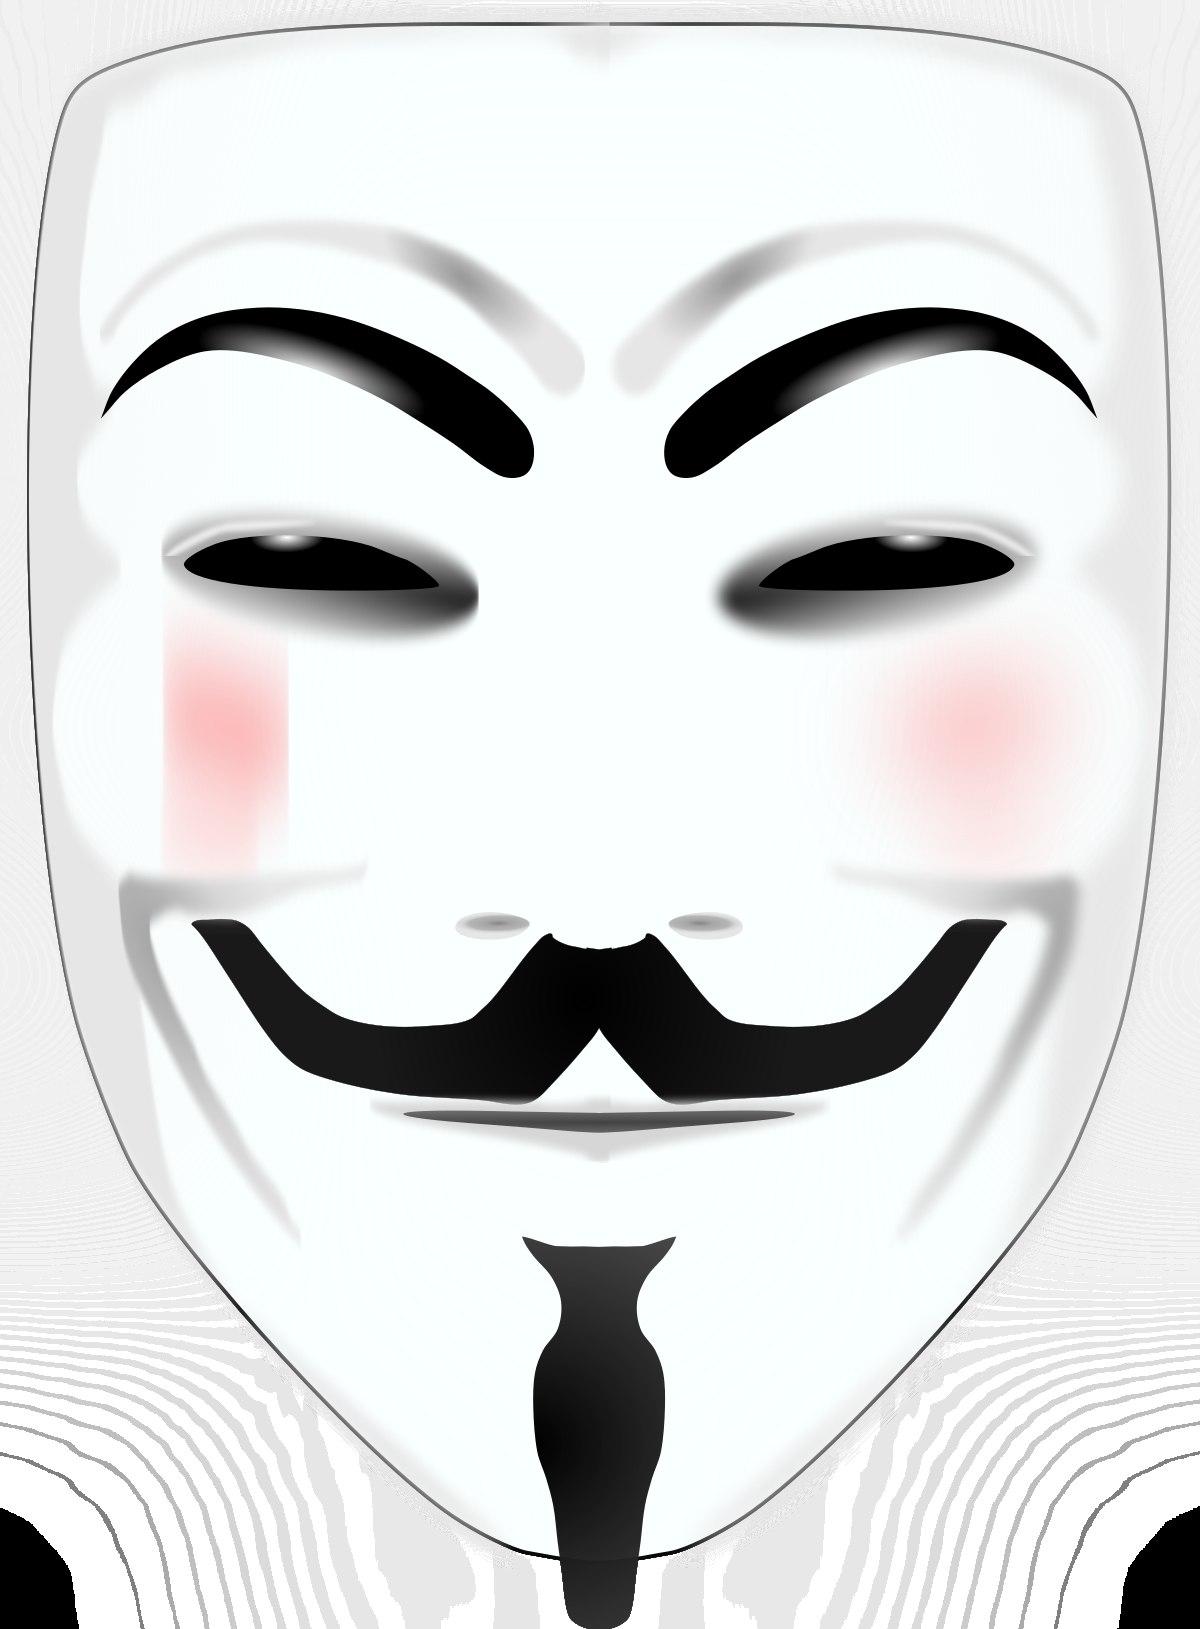 Gunpowder Plot Guy Fawkes mask Guy Fawkes Night V for Vendetta.